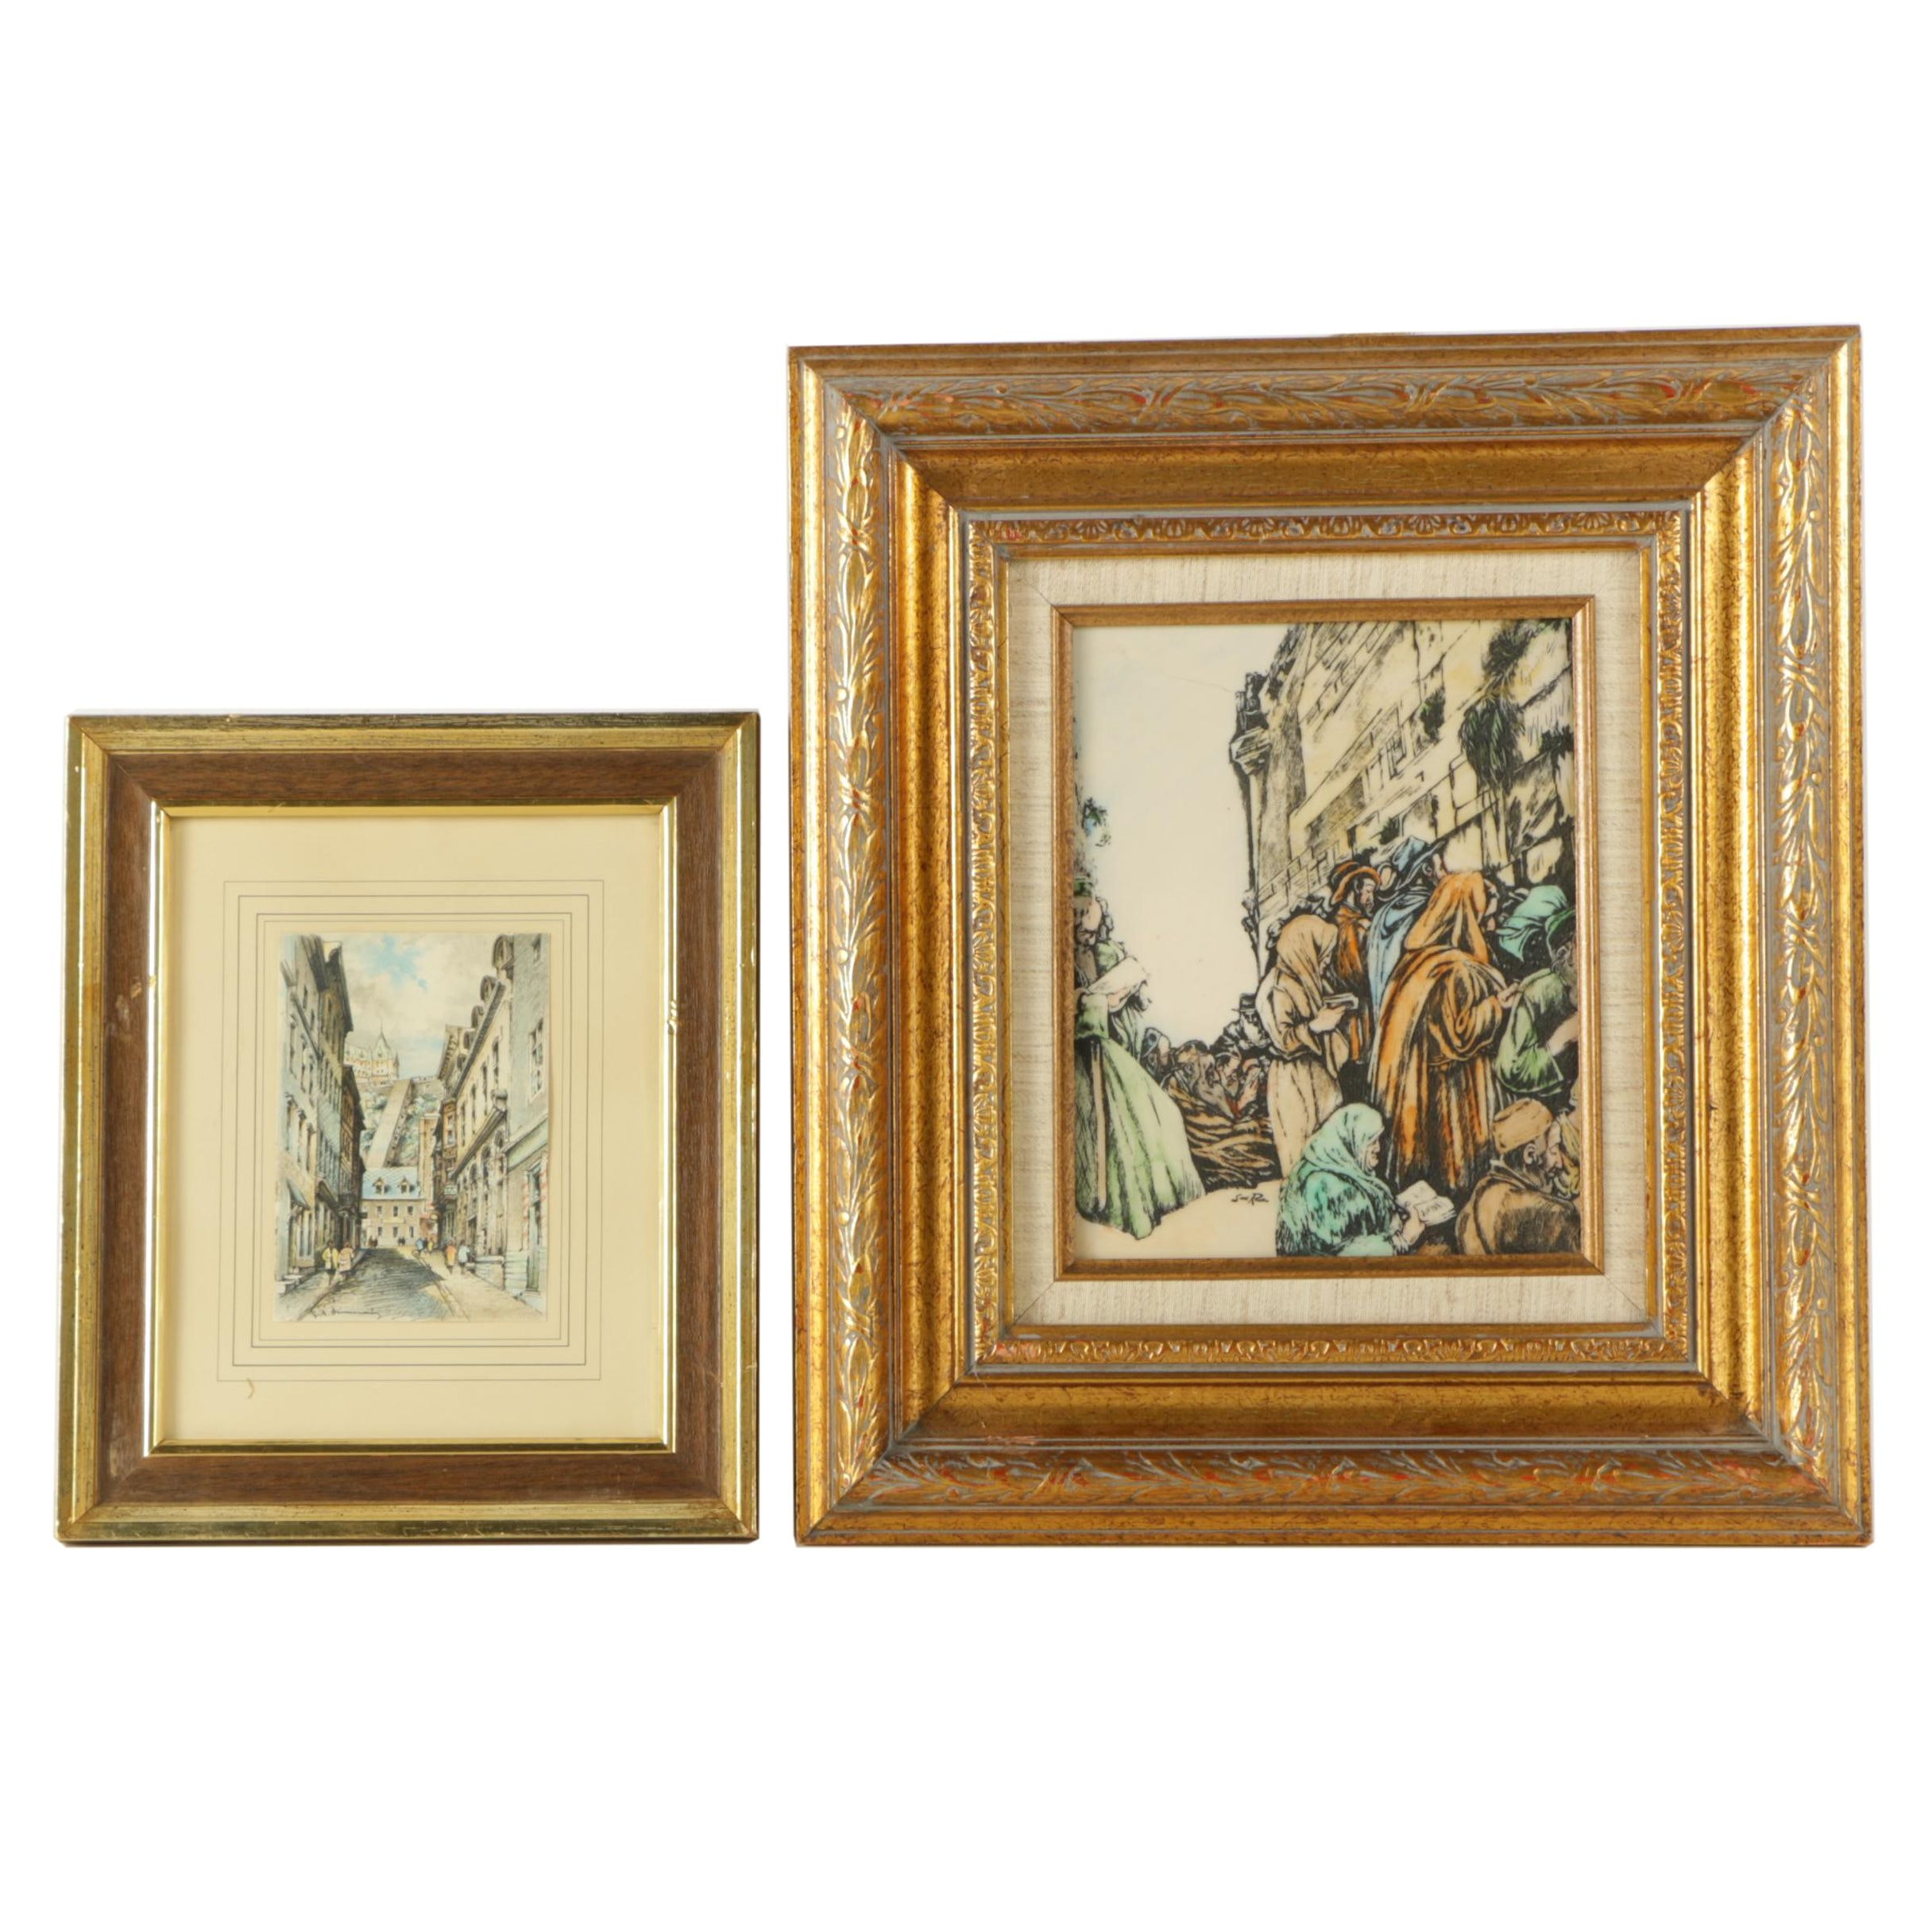 Saul Raskin Etching and Lithograph of European Street Scene